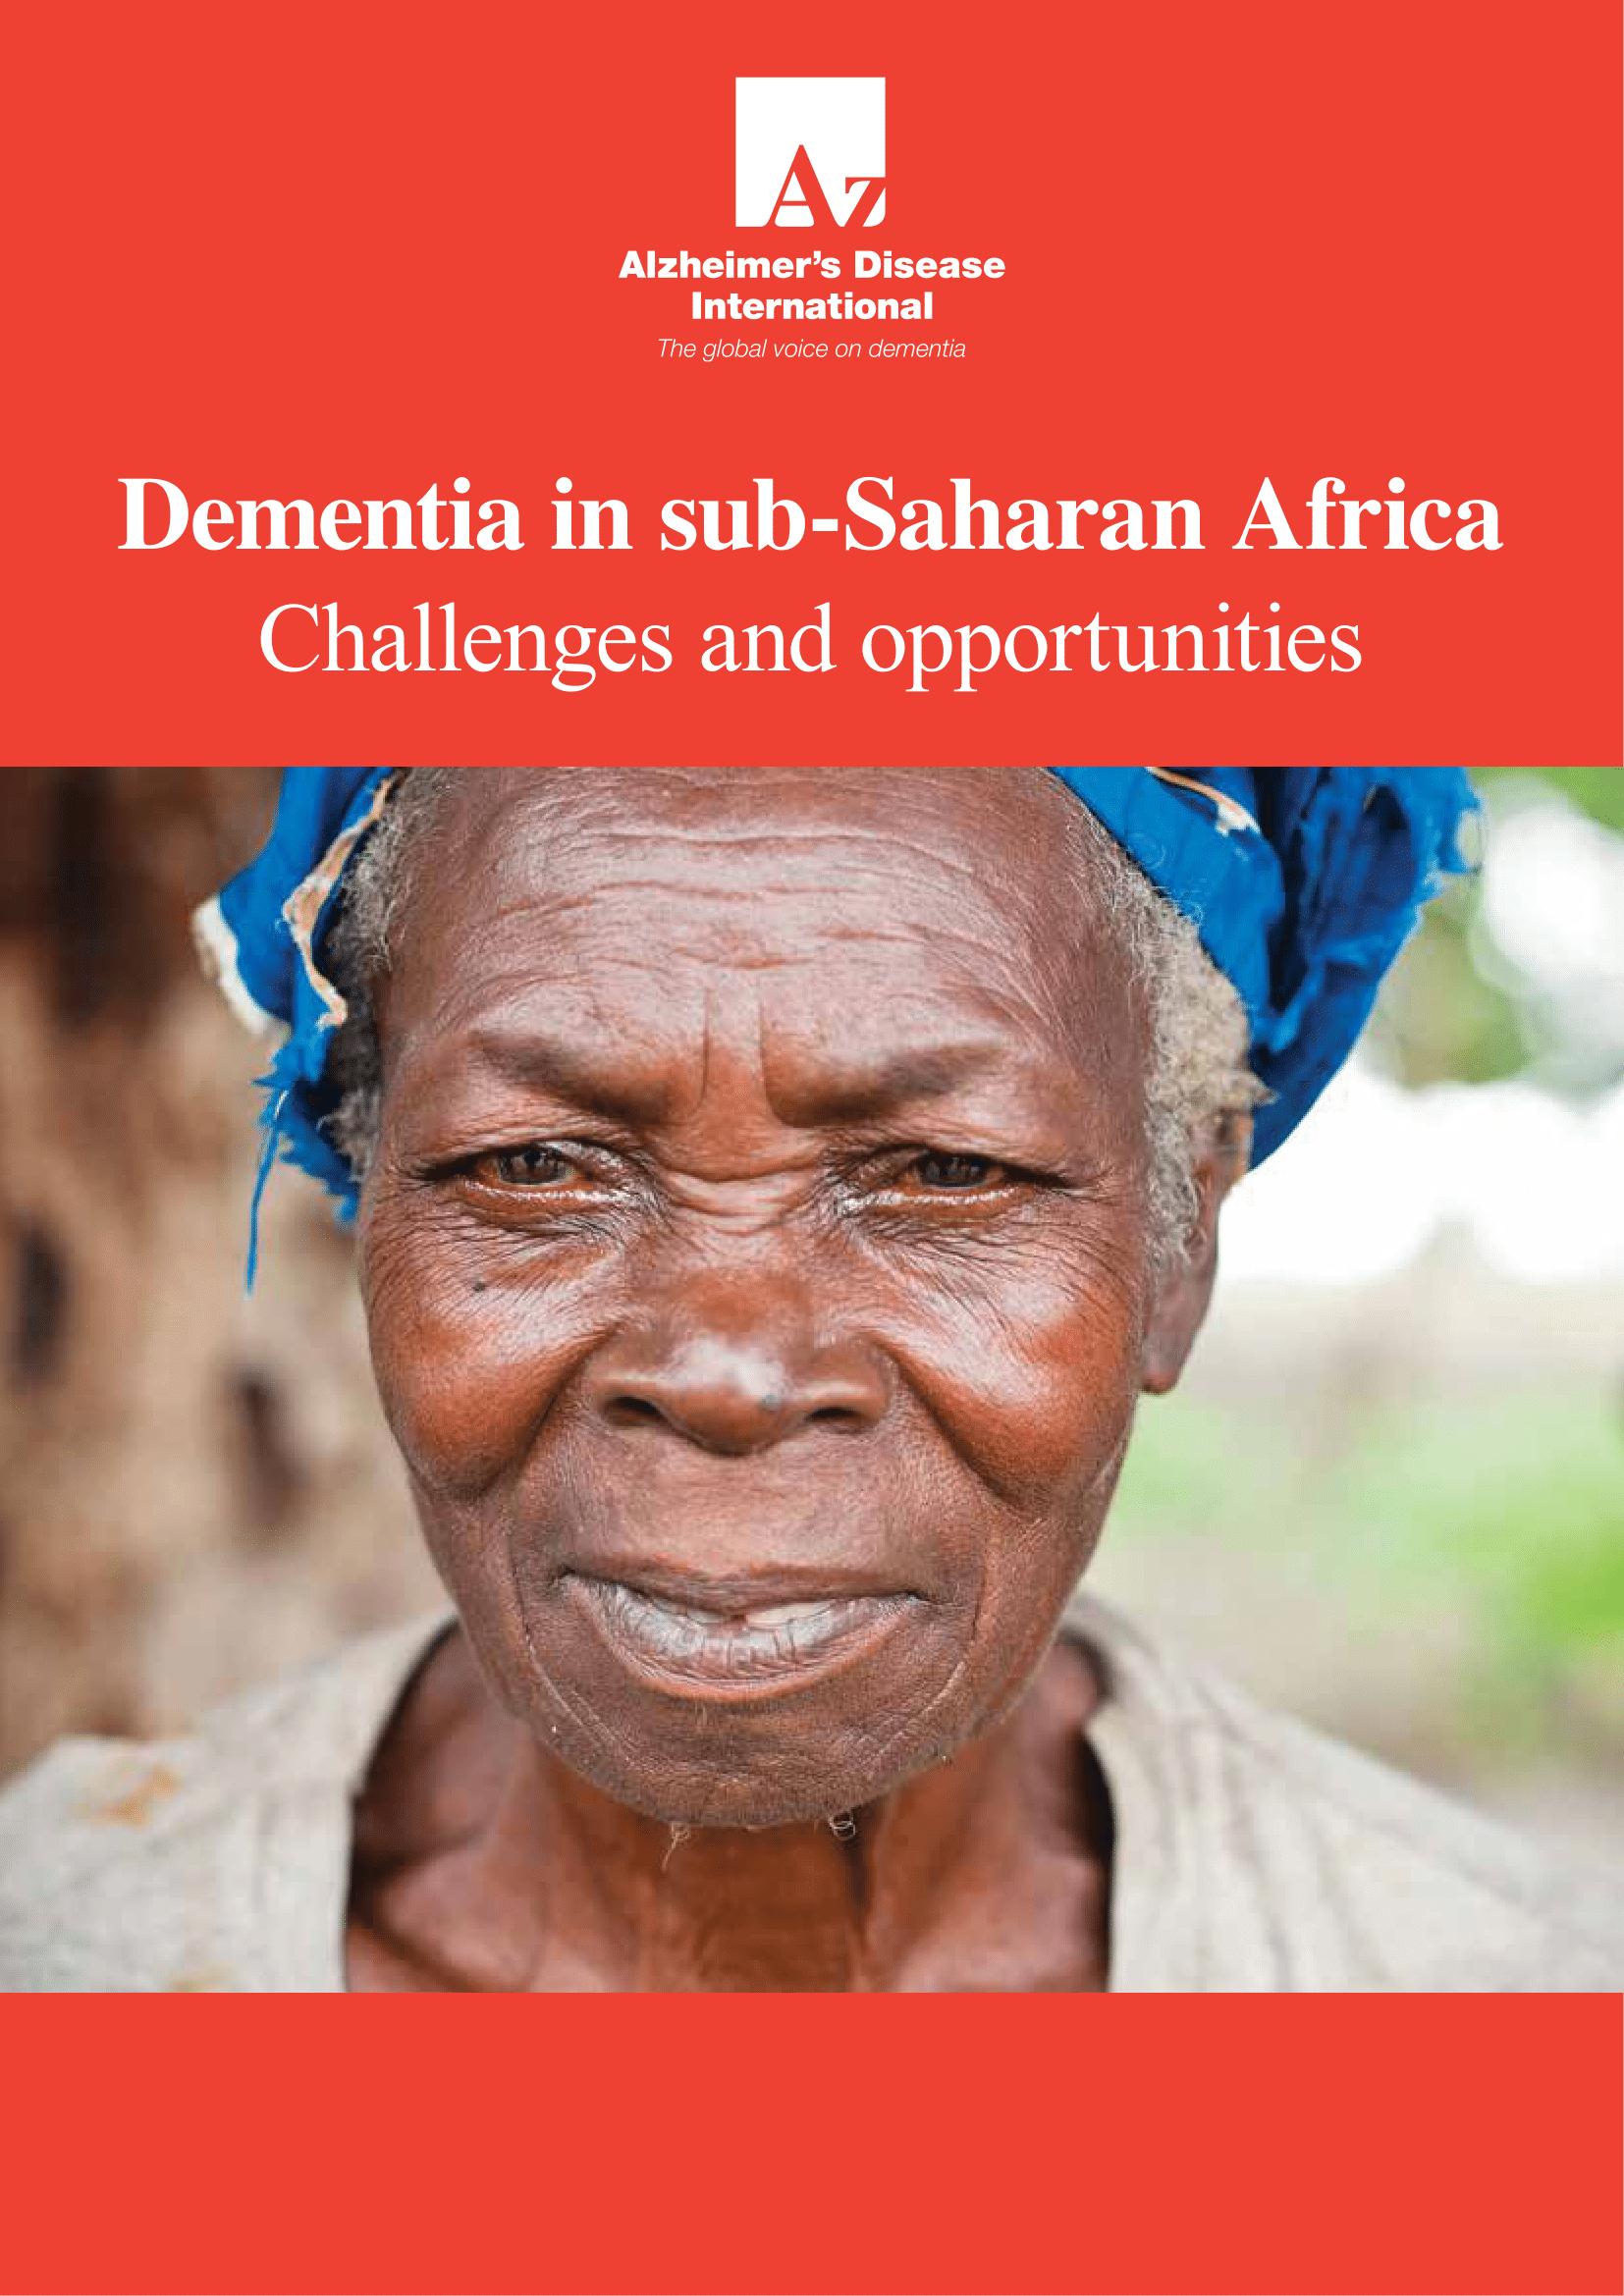 Dementia in sub-Saharan Africa Cover